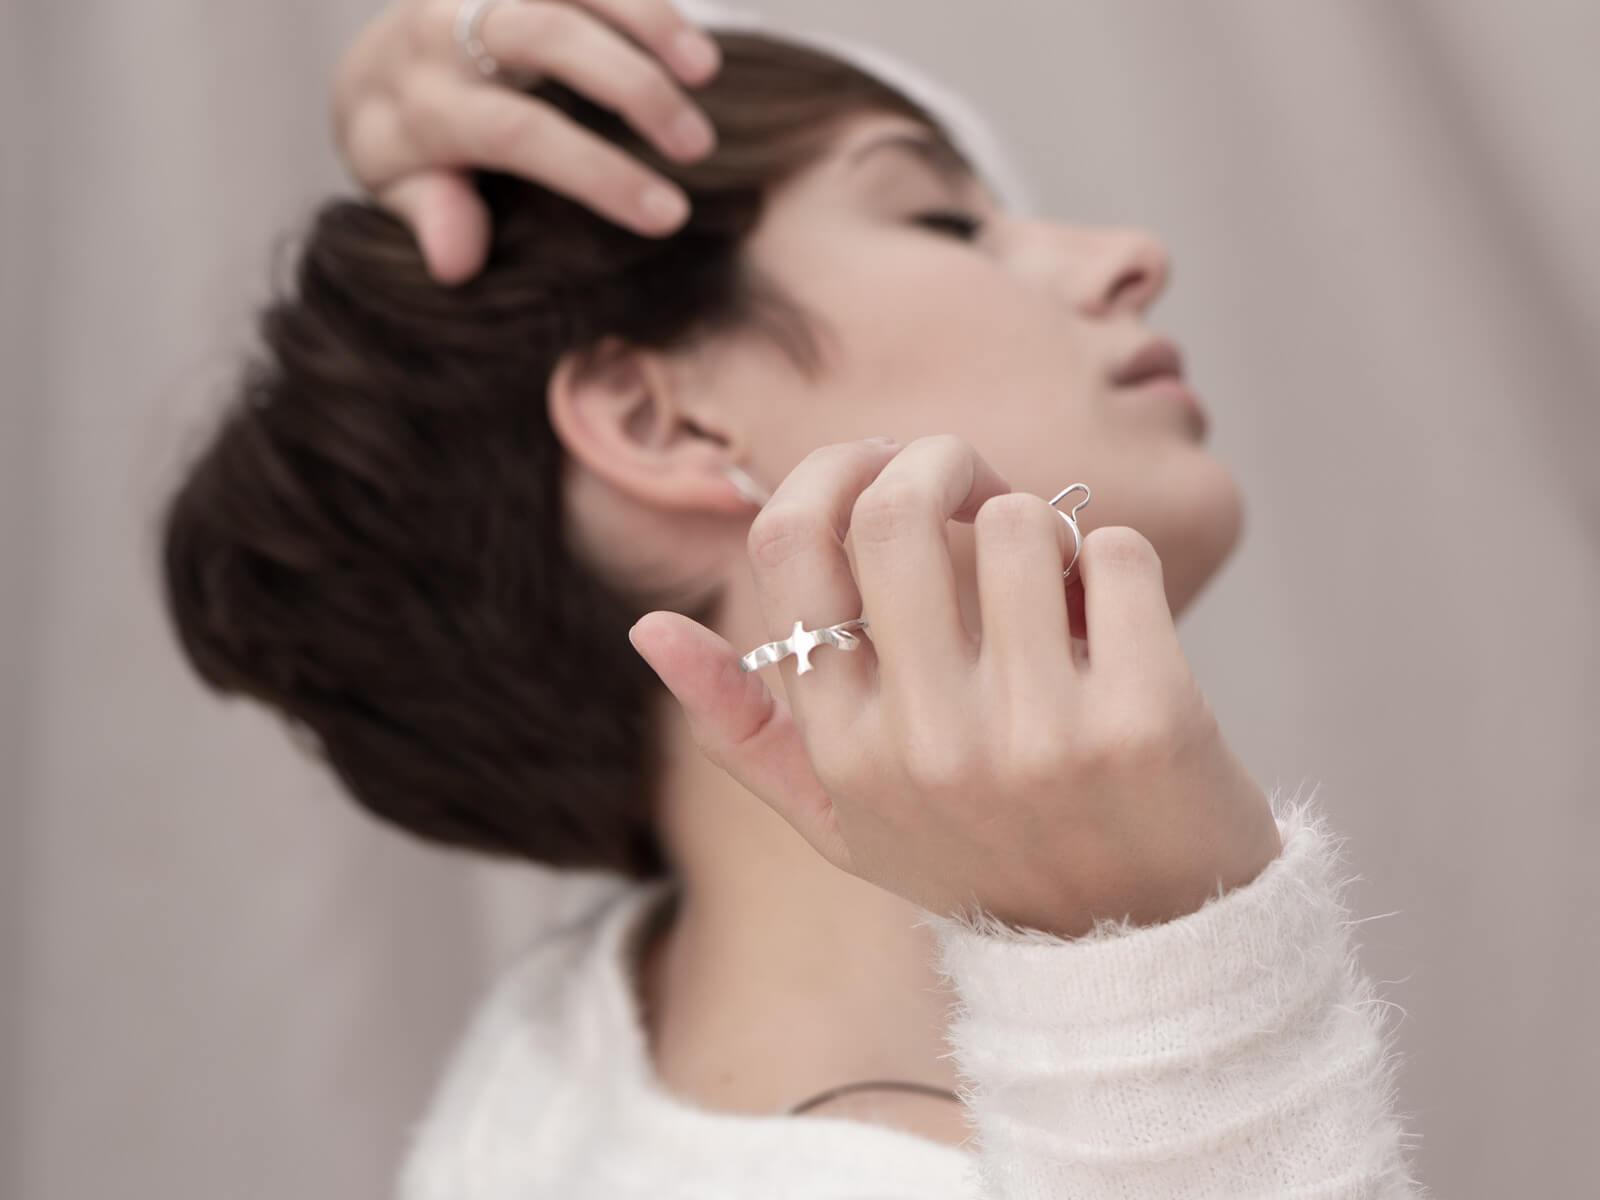 Amigo handmade silver ring